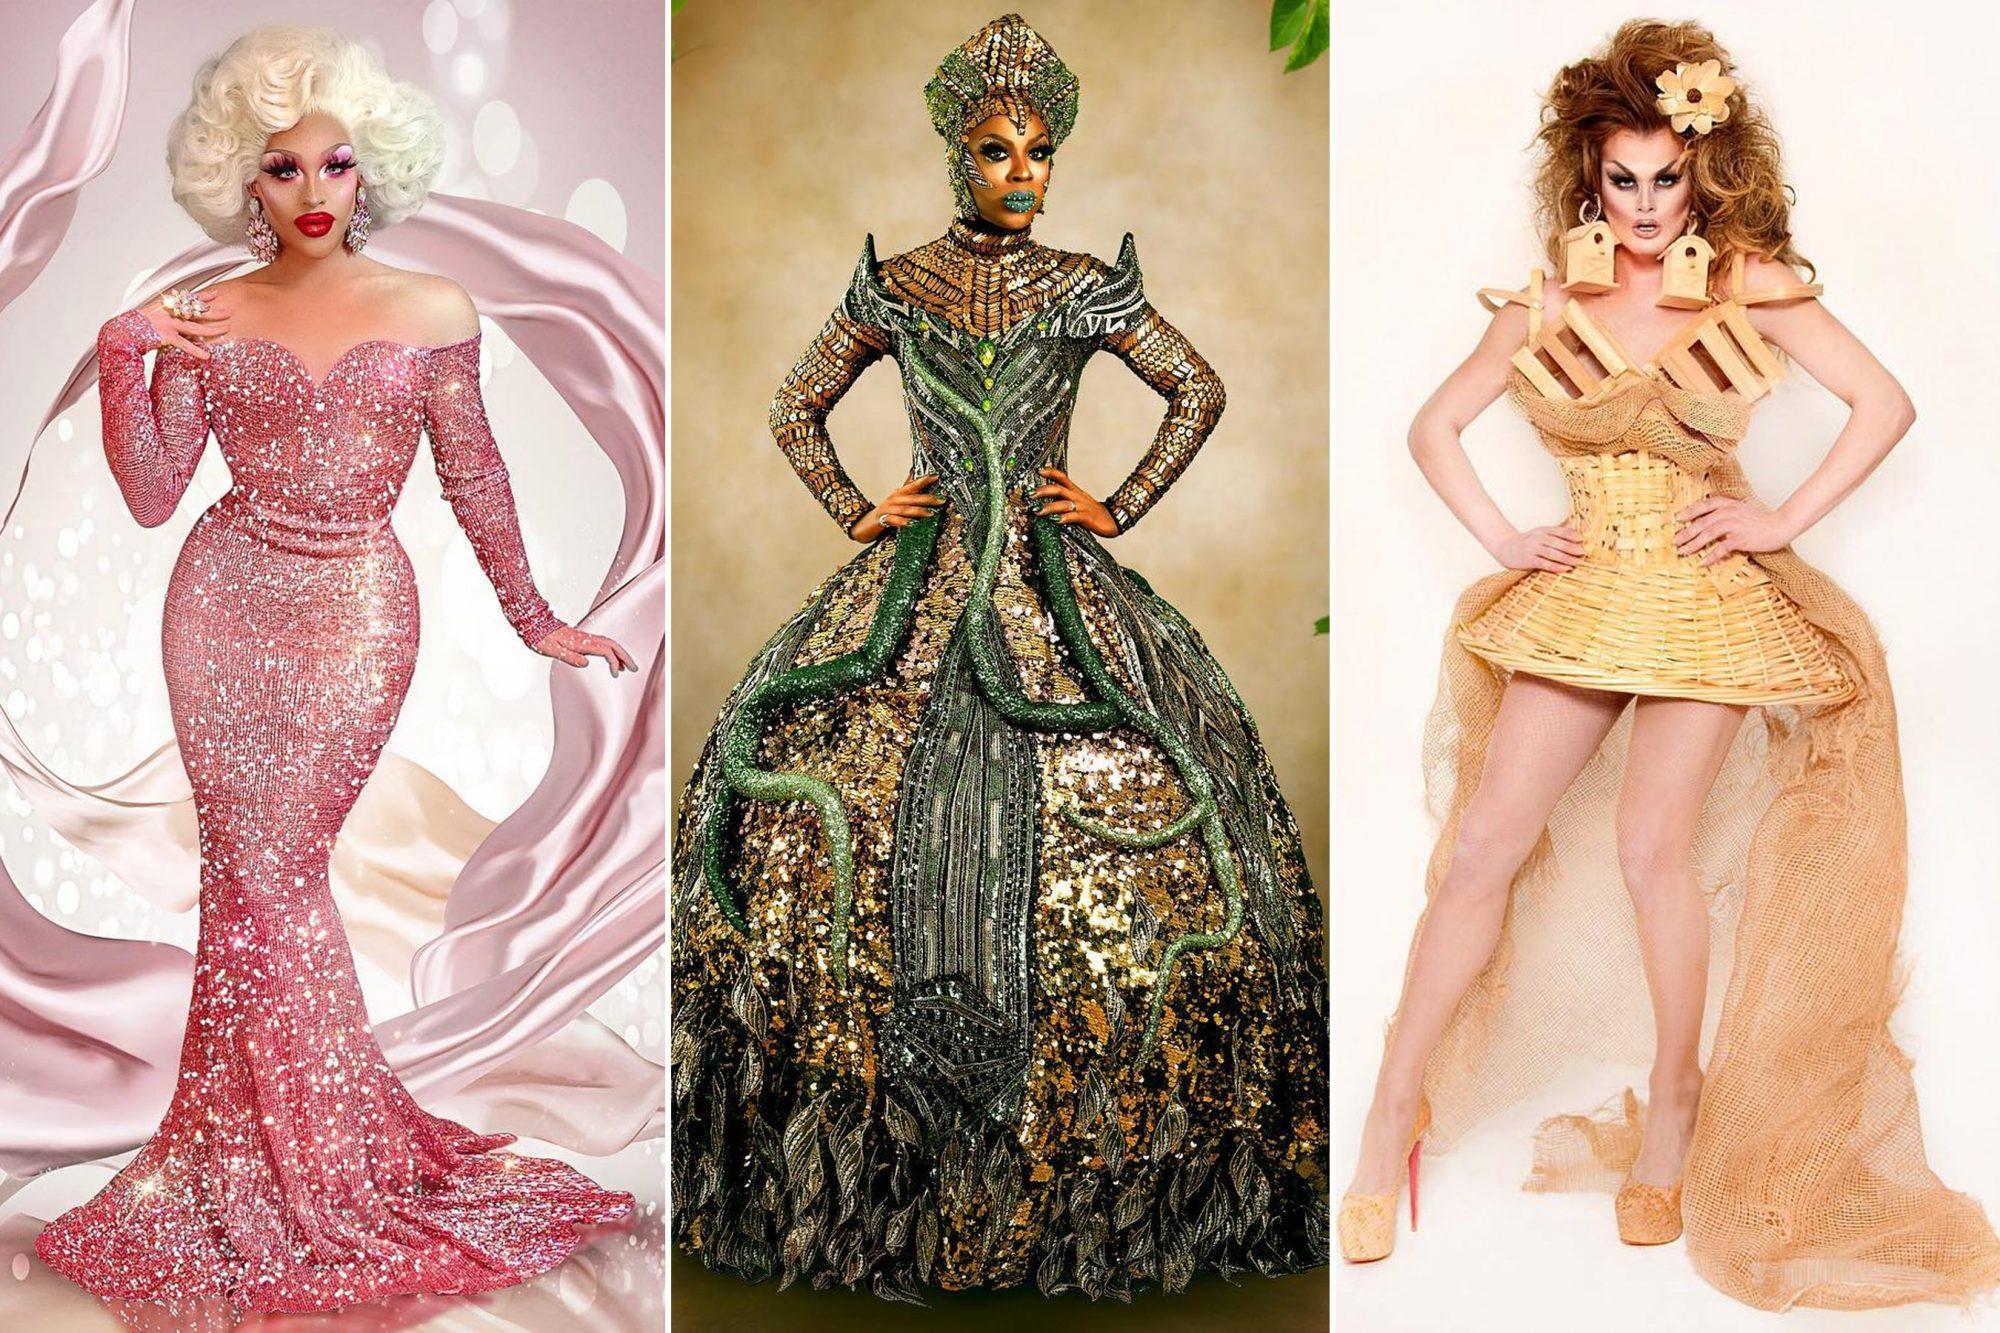 Ariel Versace; Honey Davenport; Scarlet Envy